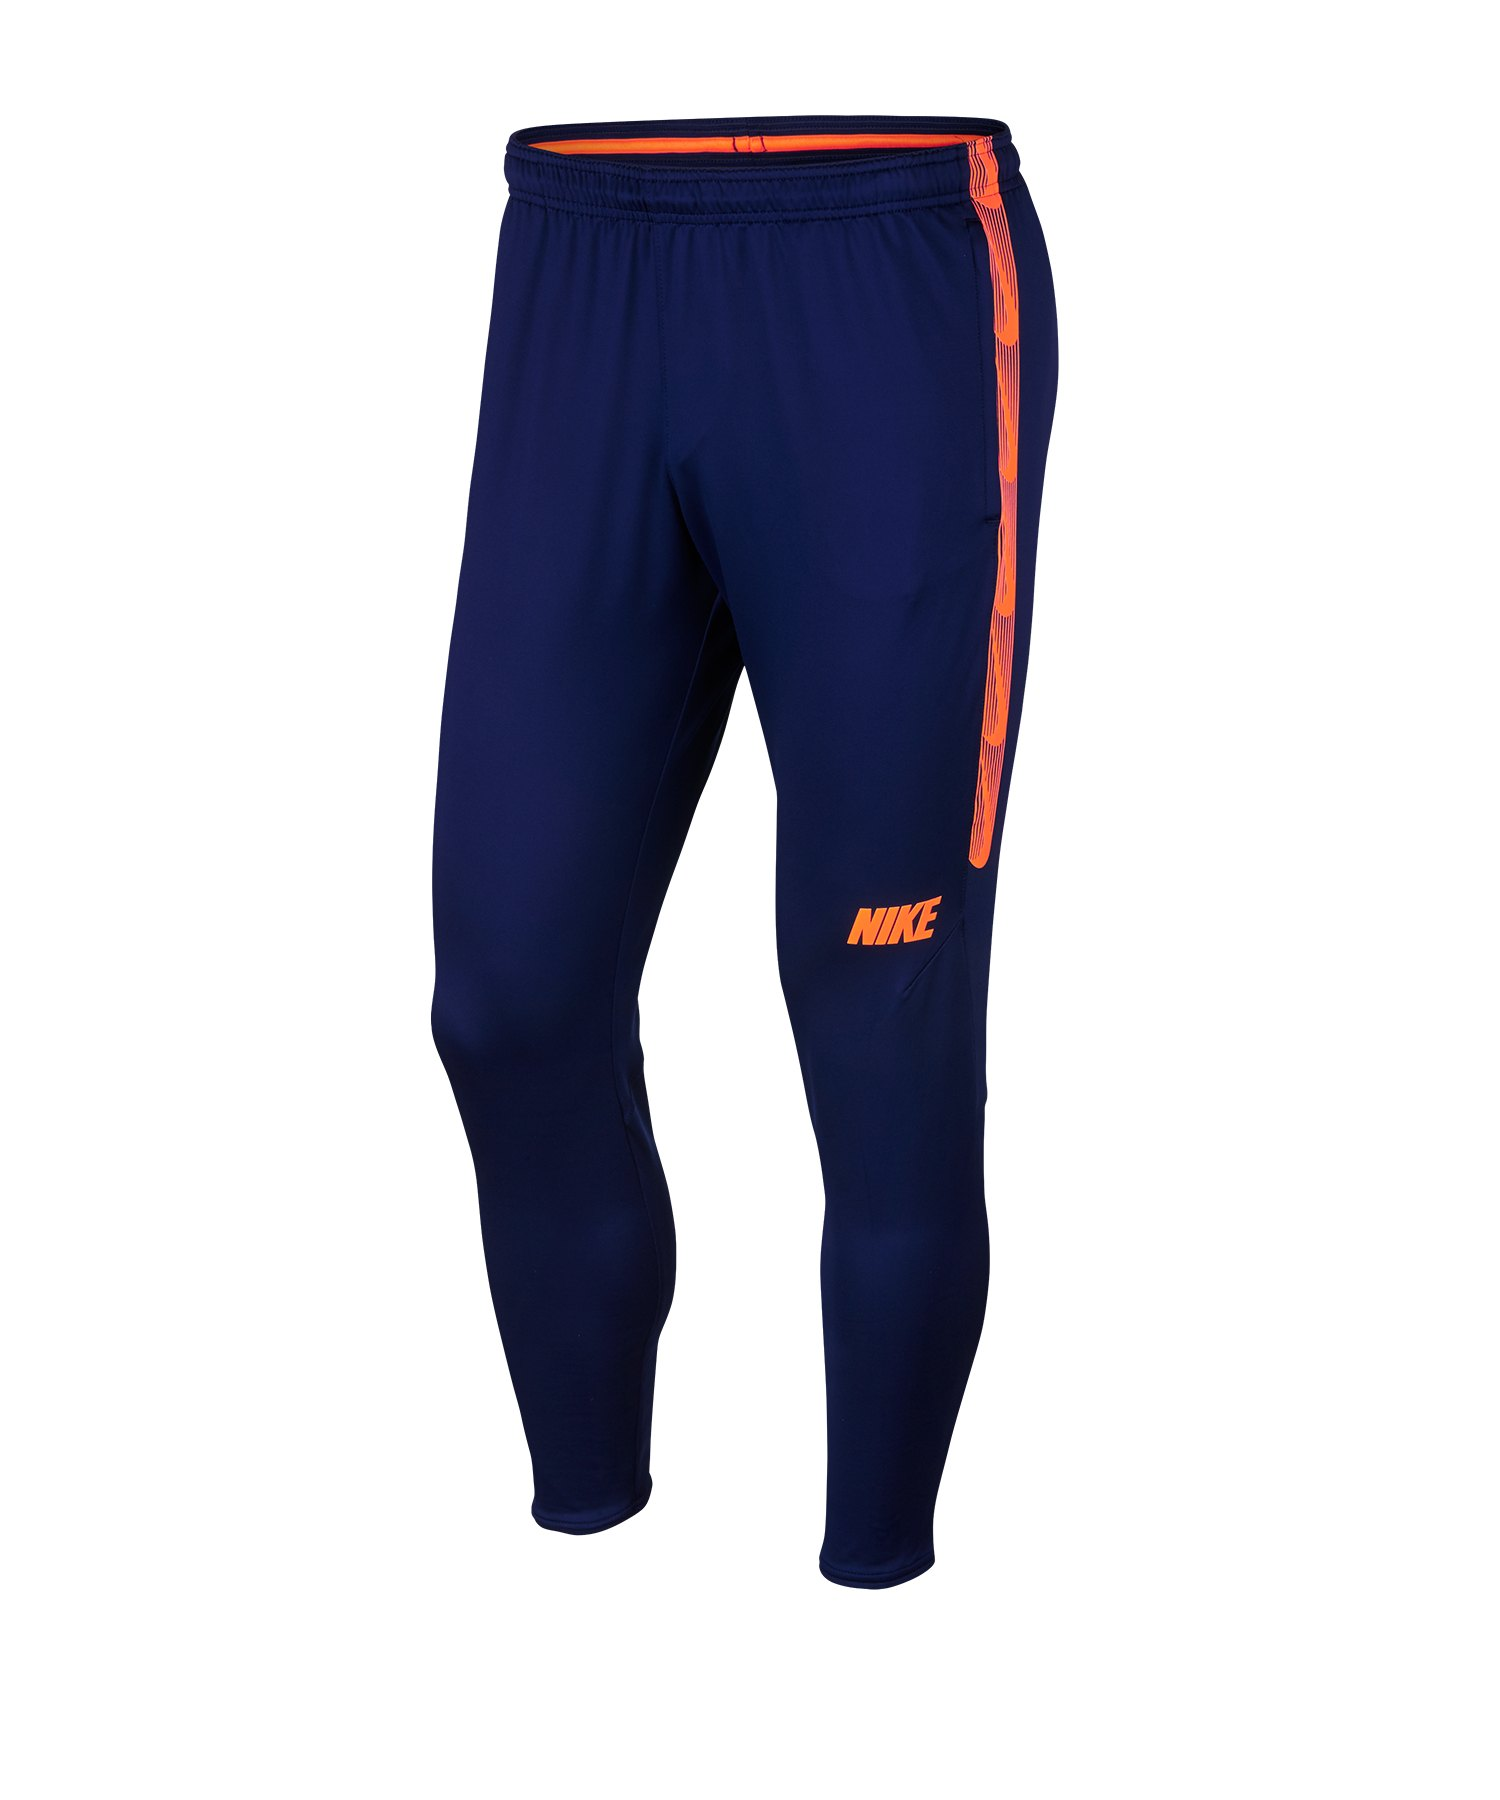 Nike Dry Squad Pant Hose Blau Orange F492 - Blau